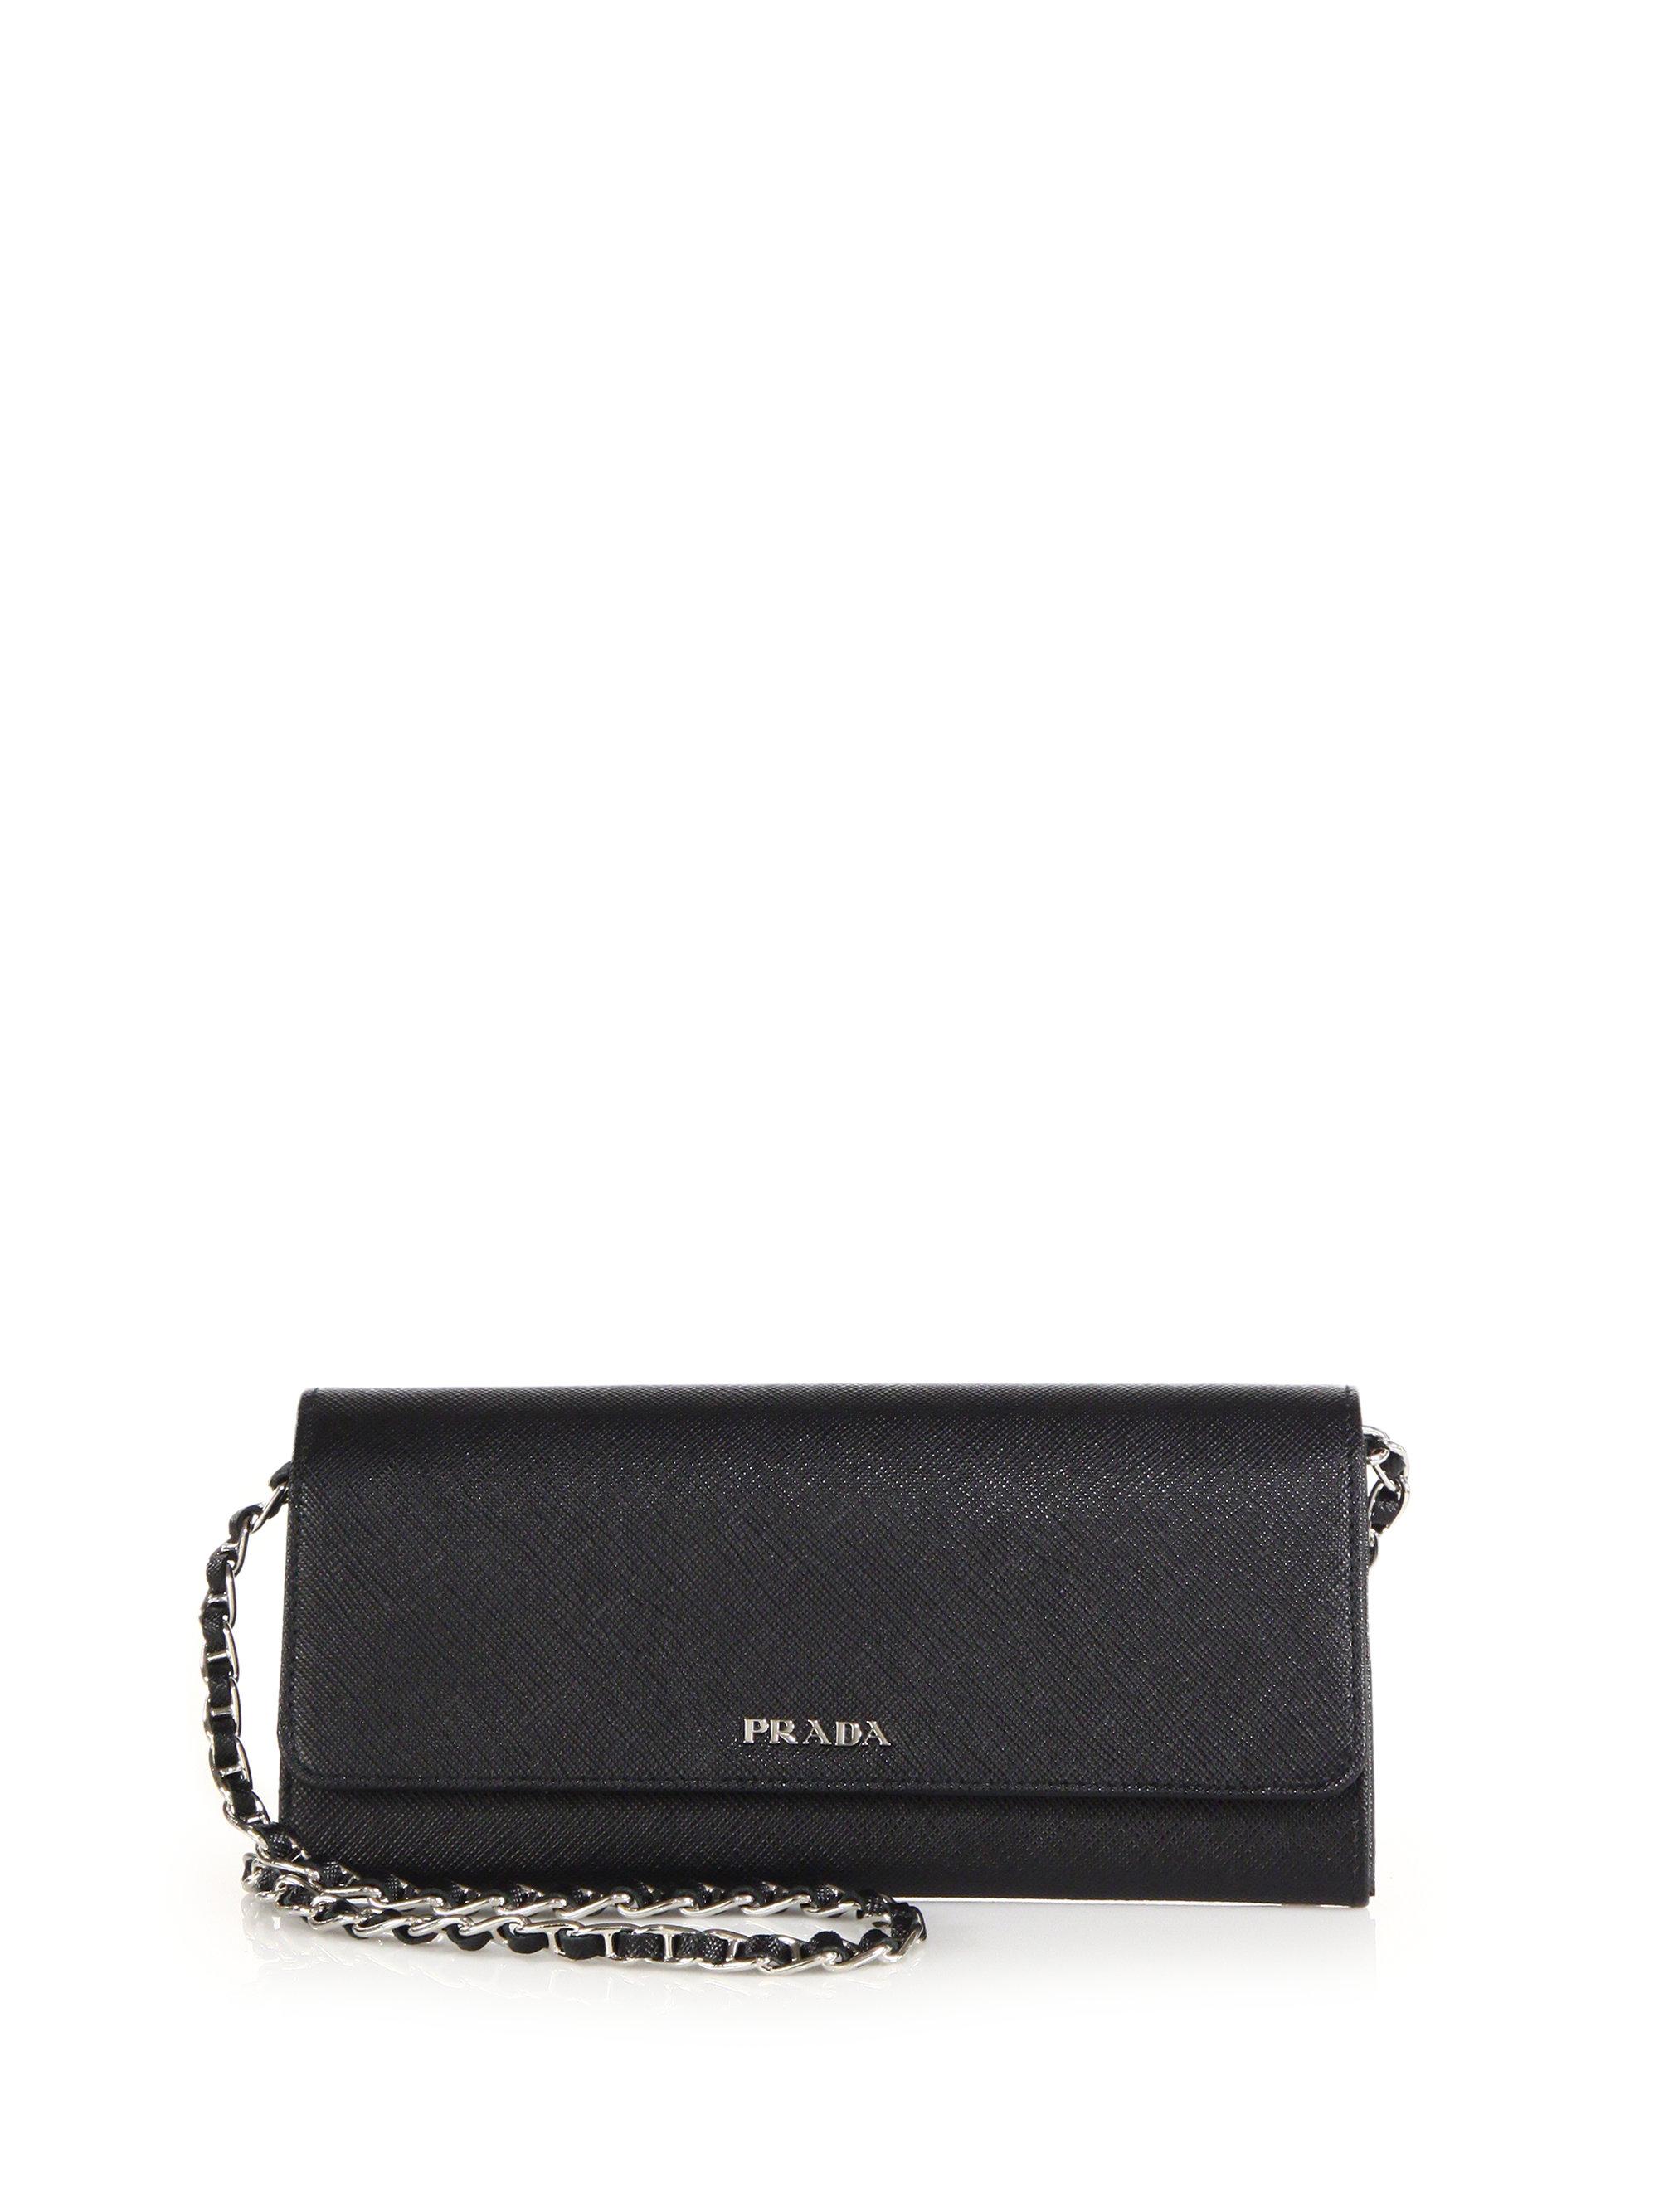 light blue prada handbag - Prada Saffiano Bicolor Chain Wallet in Black (nero) | Lyst